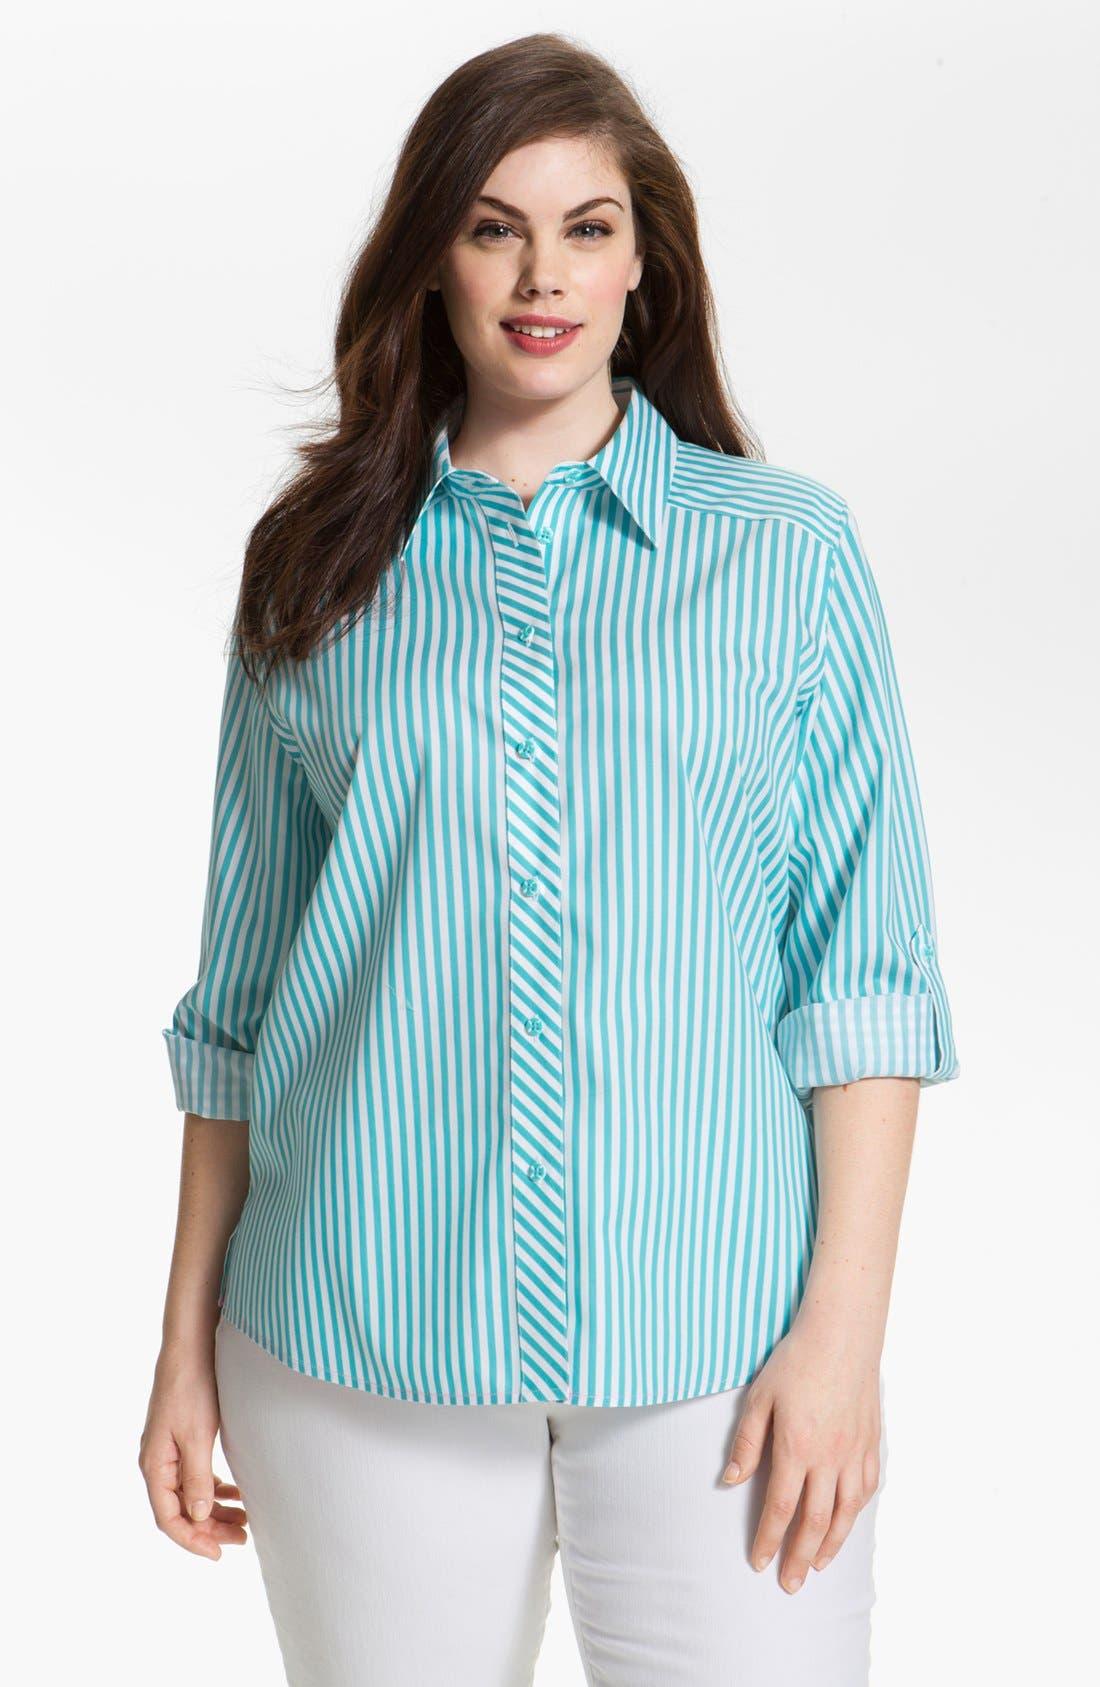 Alternate Image 1 Selected - Foxcroft Stripe Shaped Cotton Shirt (Plus Size)